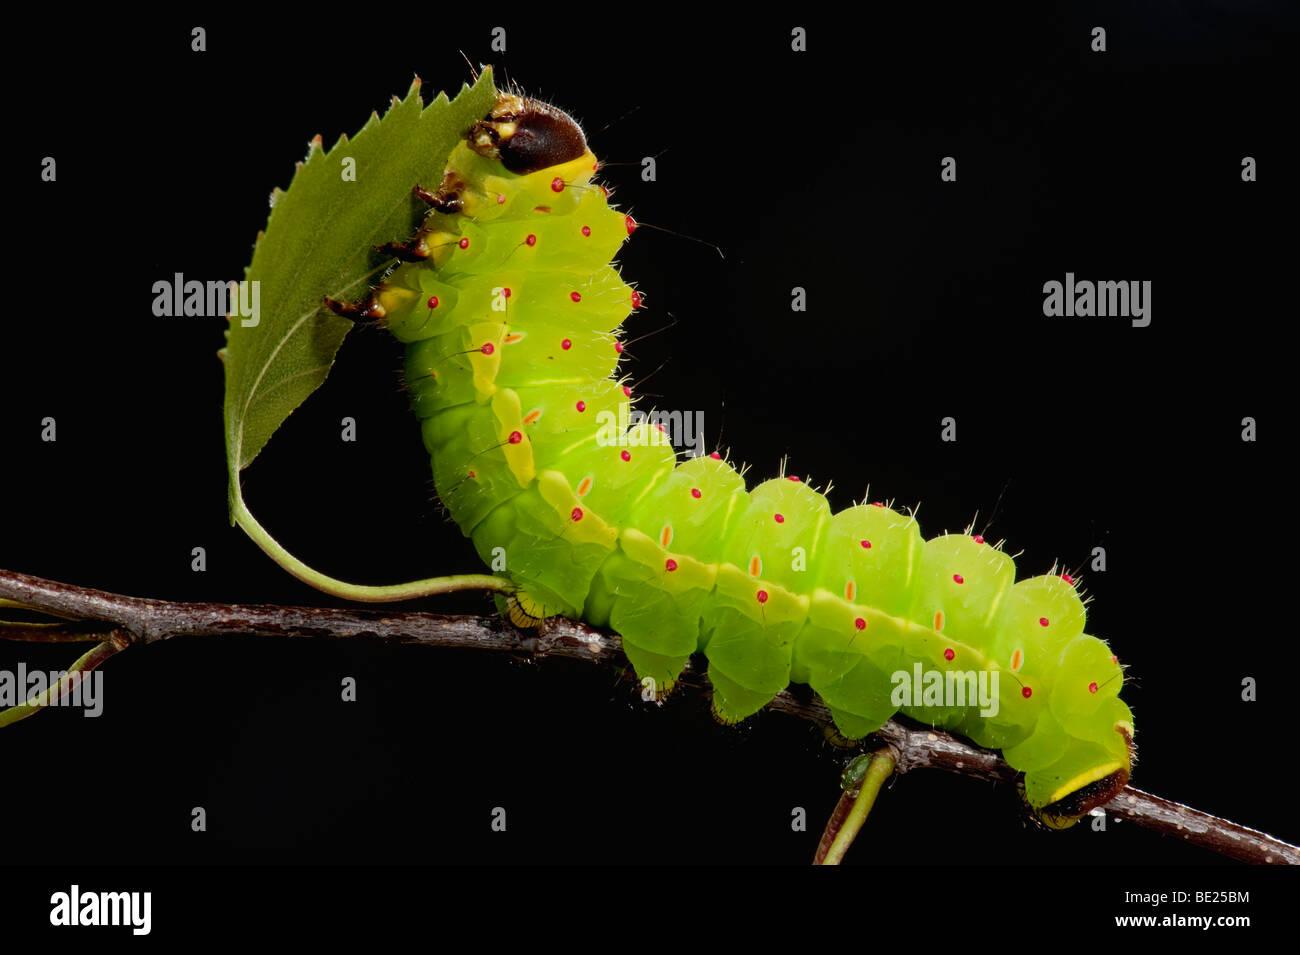 Luna o Luna Actias luna larvas de polilla Caterpillar alimentándose de hojas de abedul verde brillante Imagen De Stock